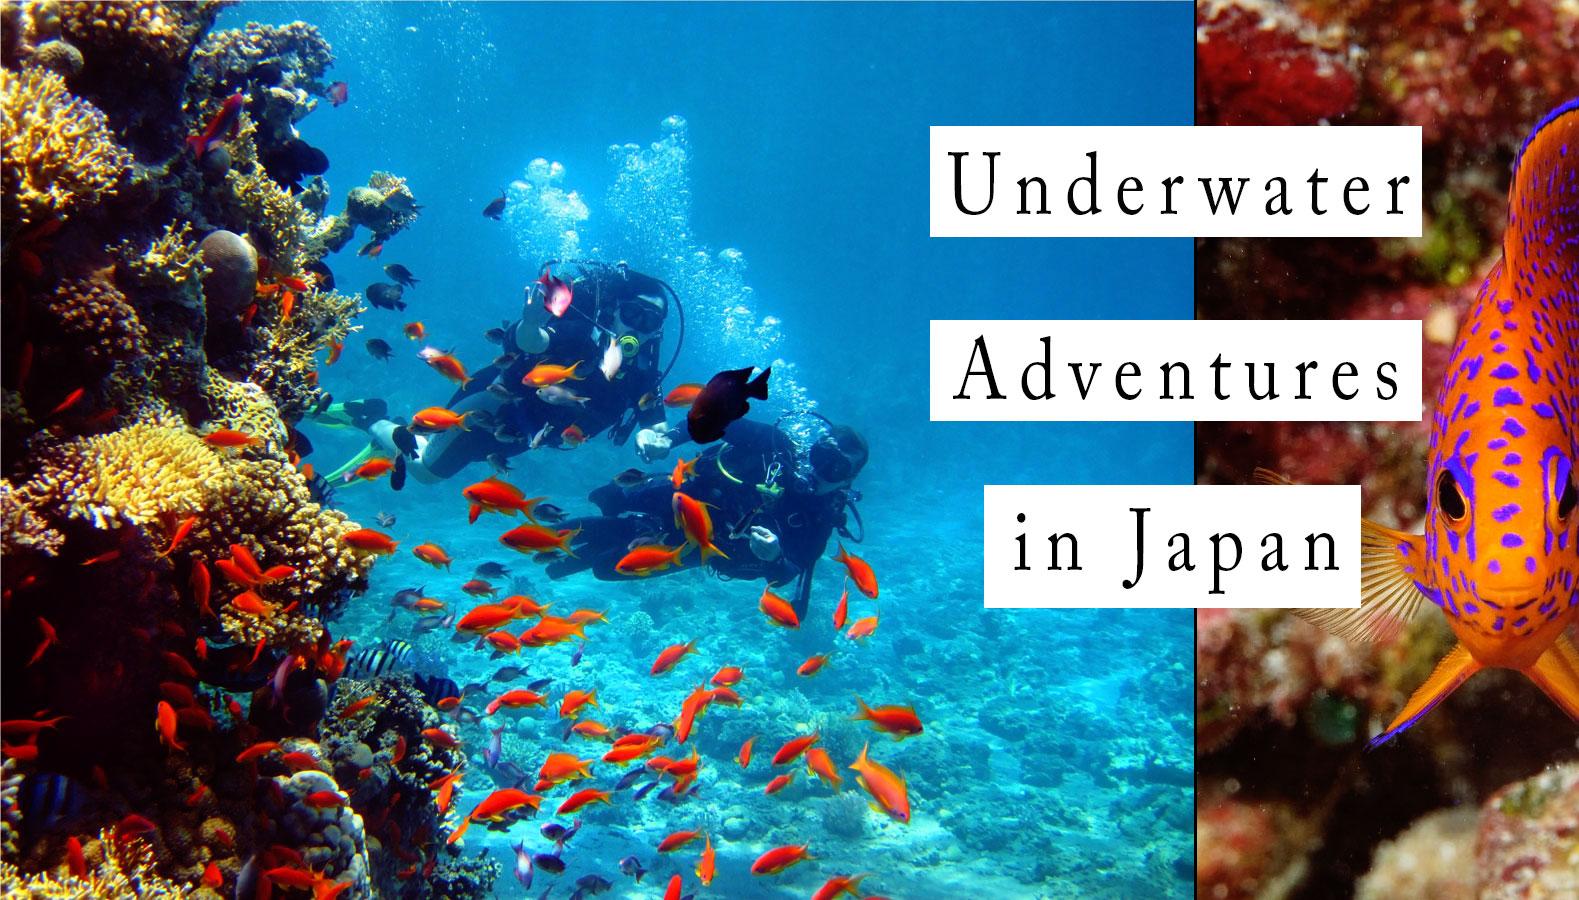 Diving Cover - Underwater Adventures: Scuba Diving in Japan